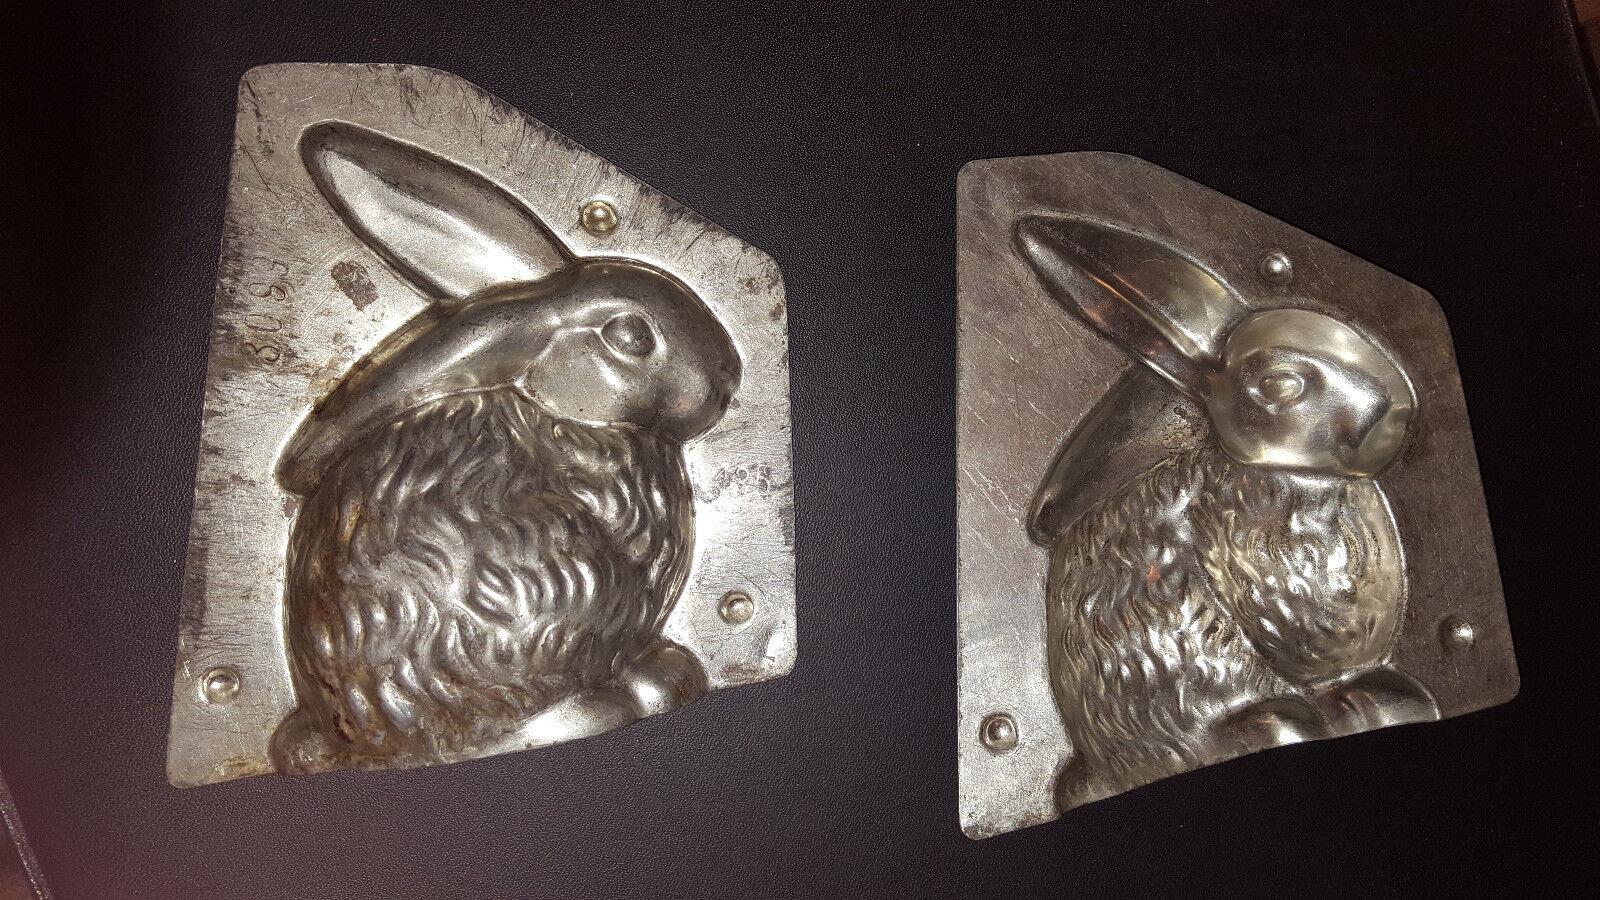 SCHOKOLADEN-FORM 3099laurösch Alte Backform Form Schokolade Chocolate mold moule